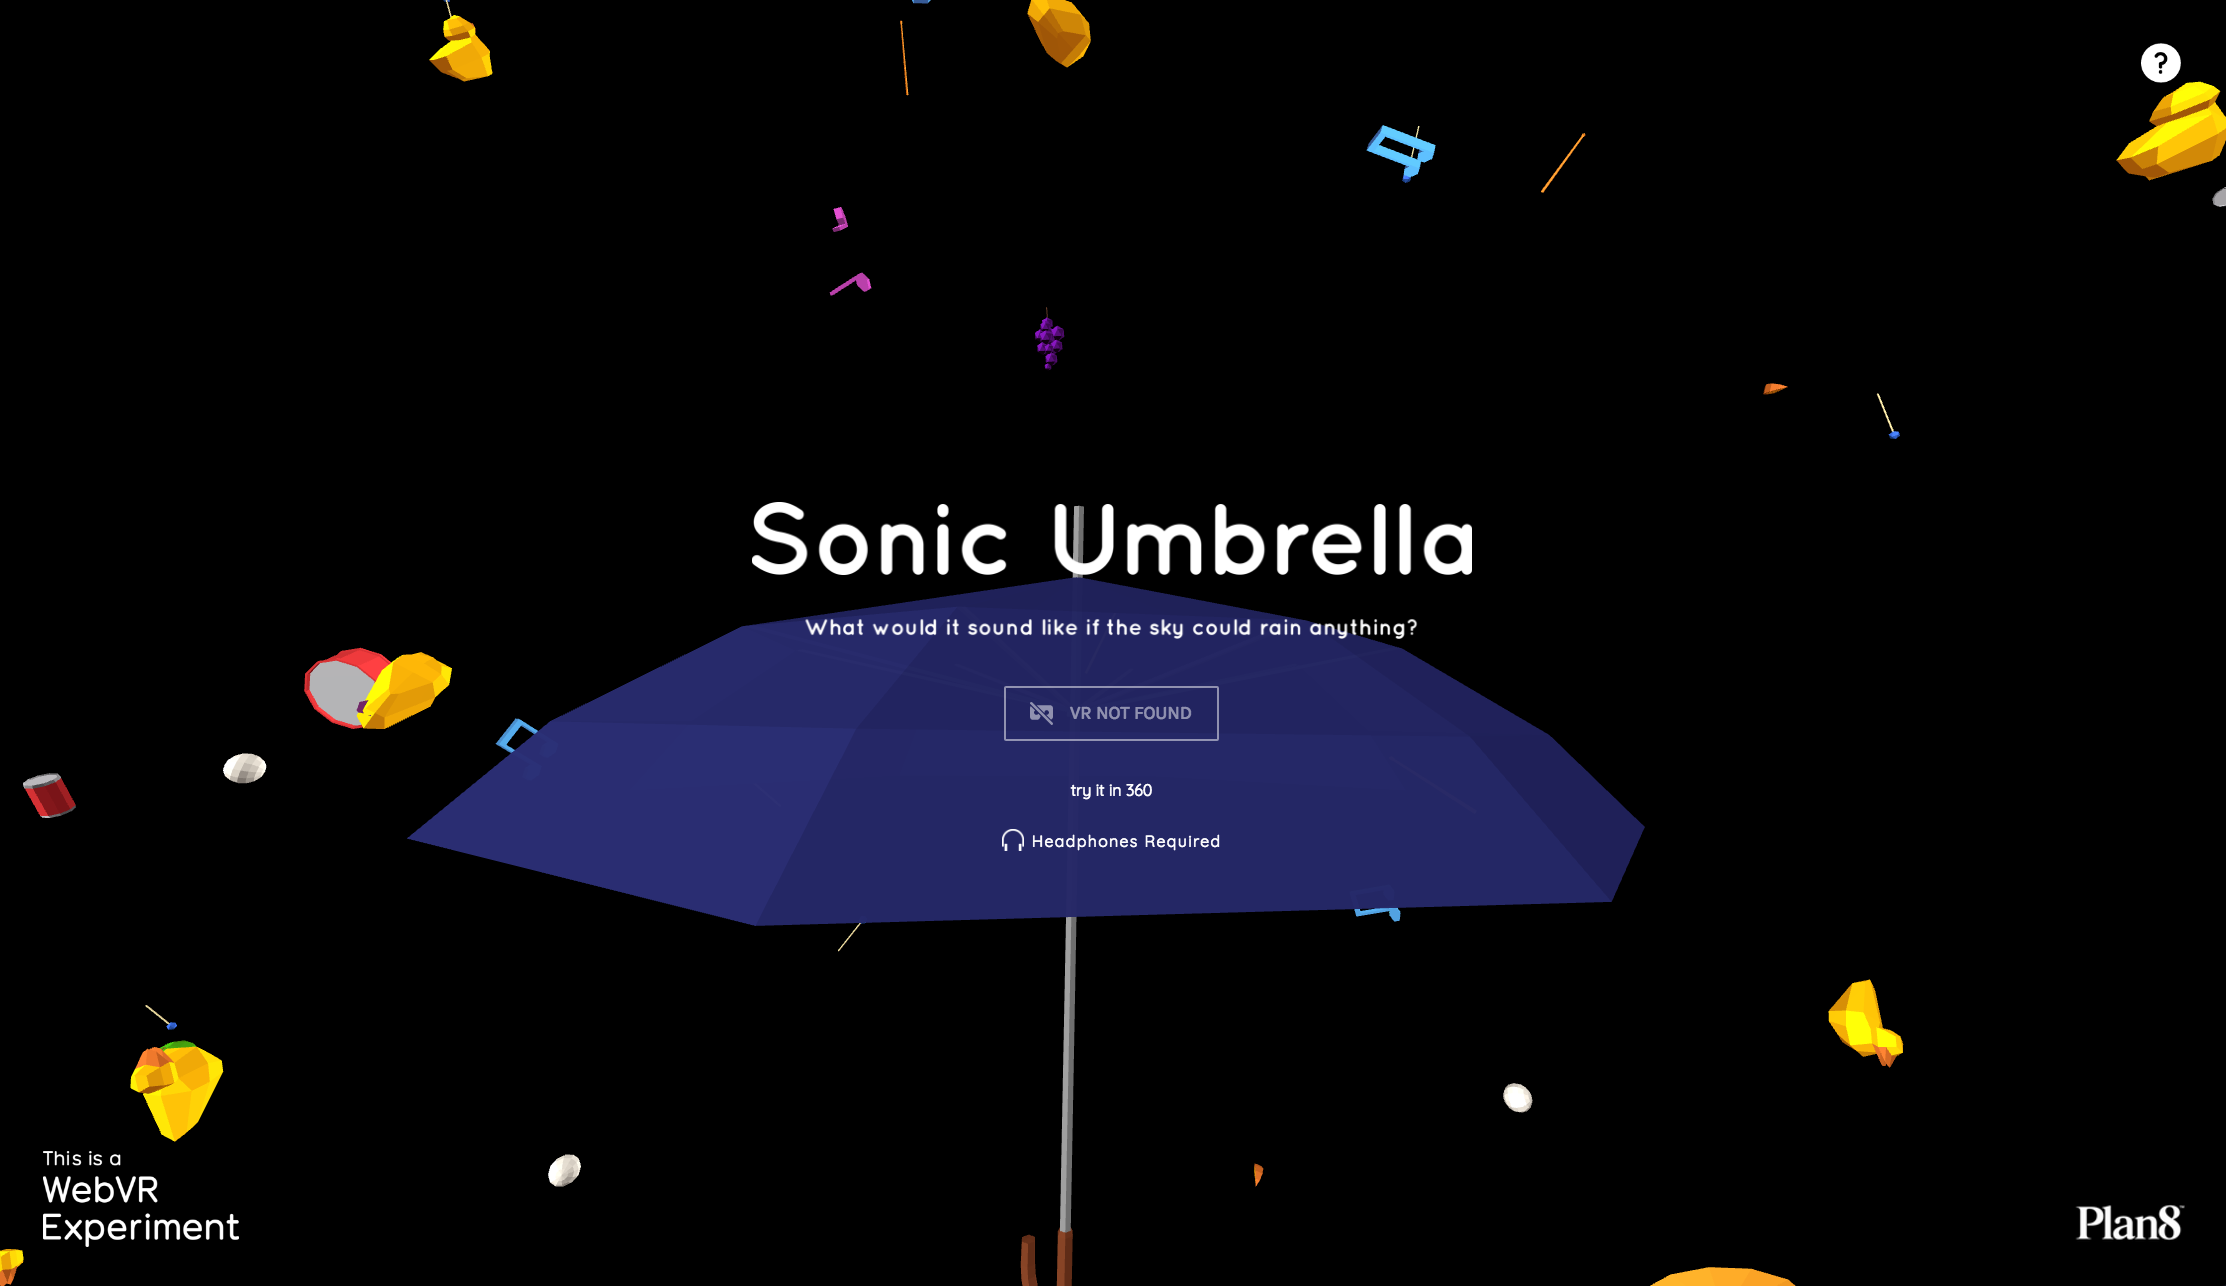 sonicumbrella